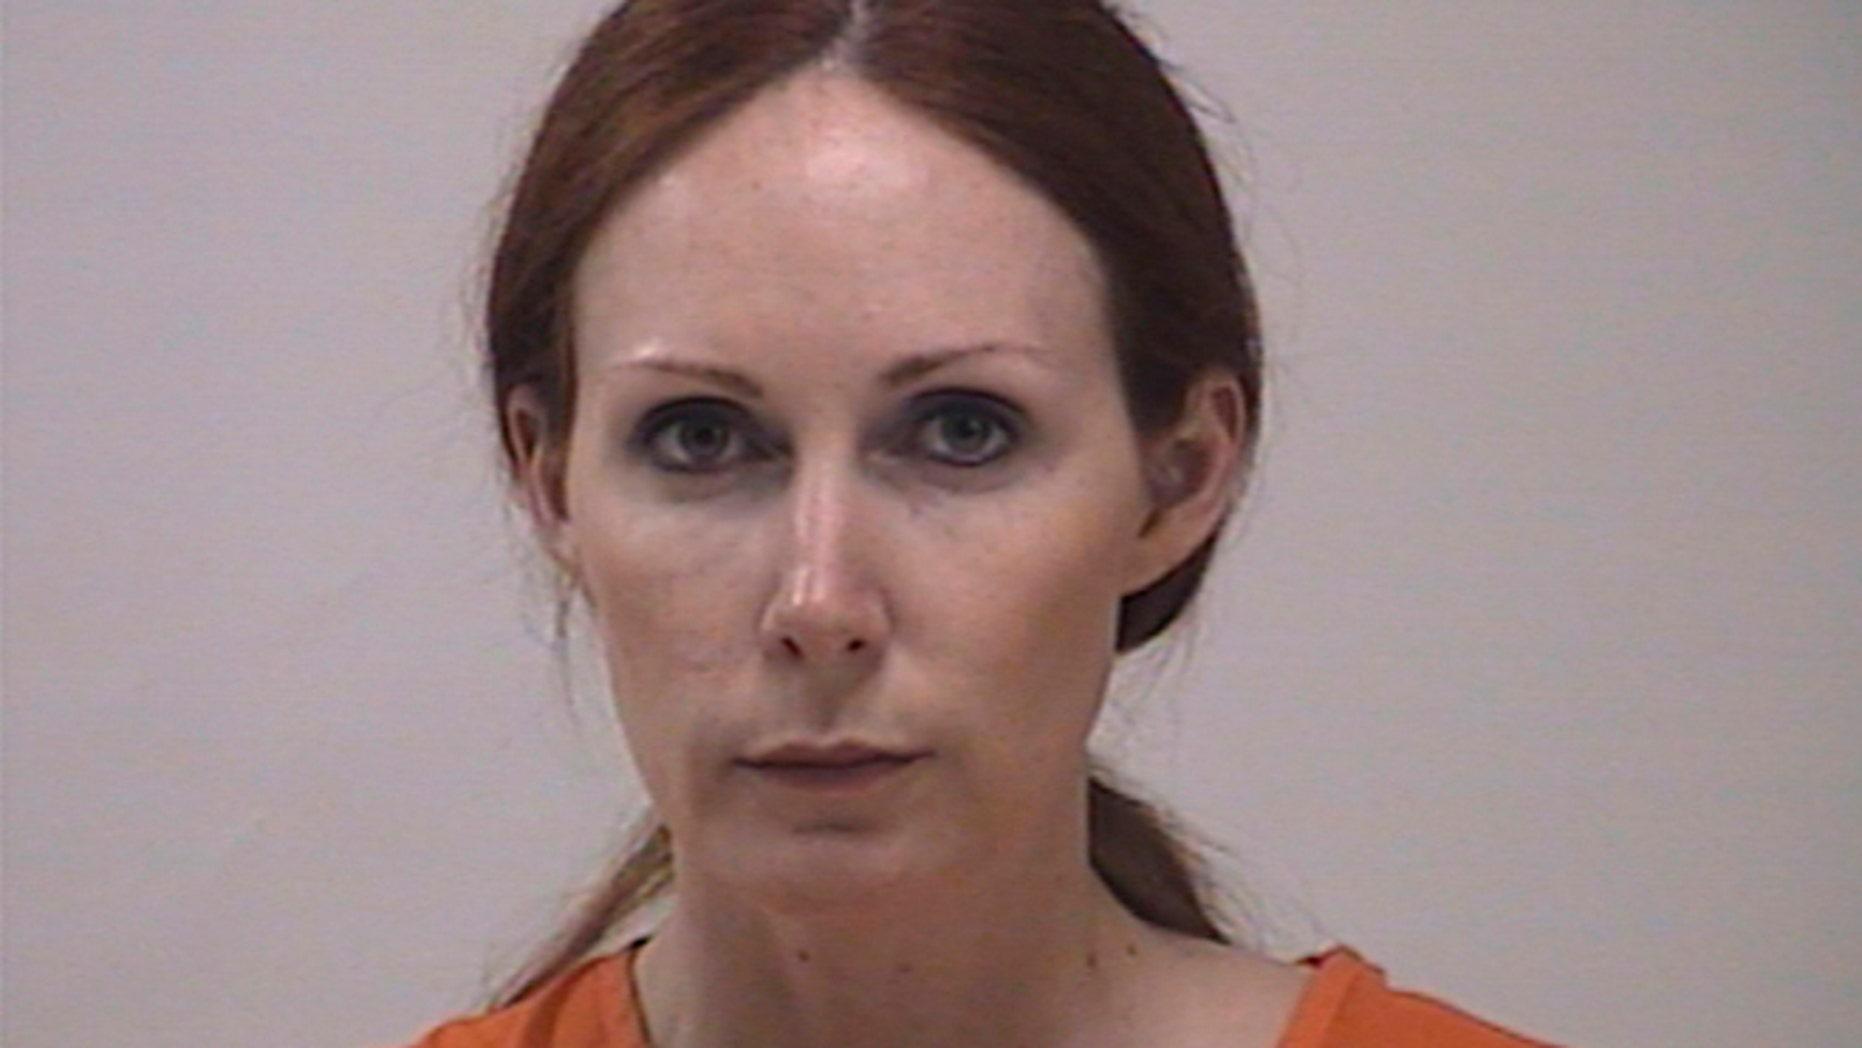 Shannon Guess Richardson entered her guilty plea Tuesday in Texarkana, Texas.